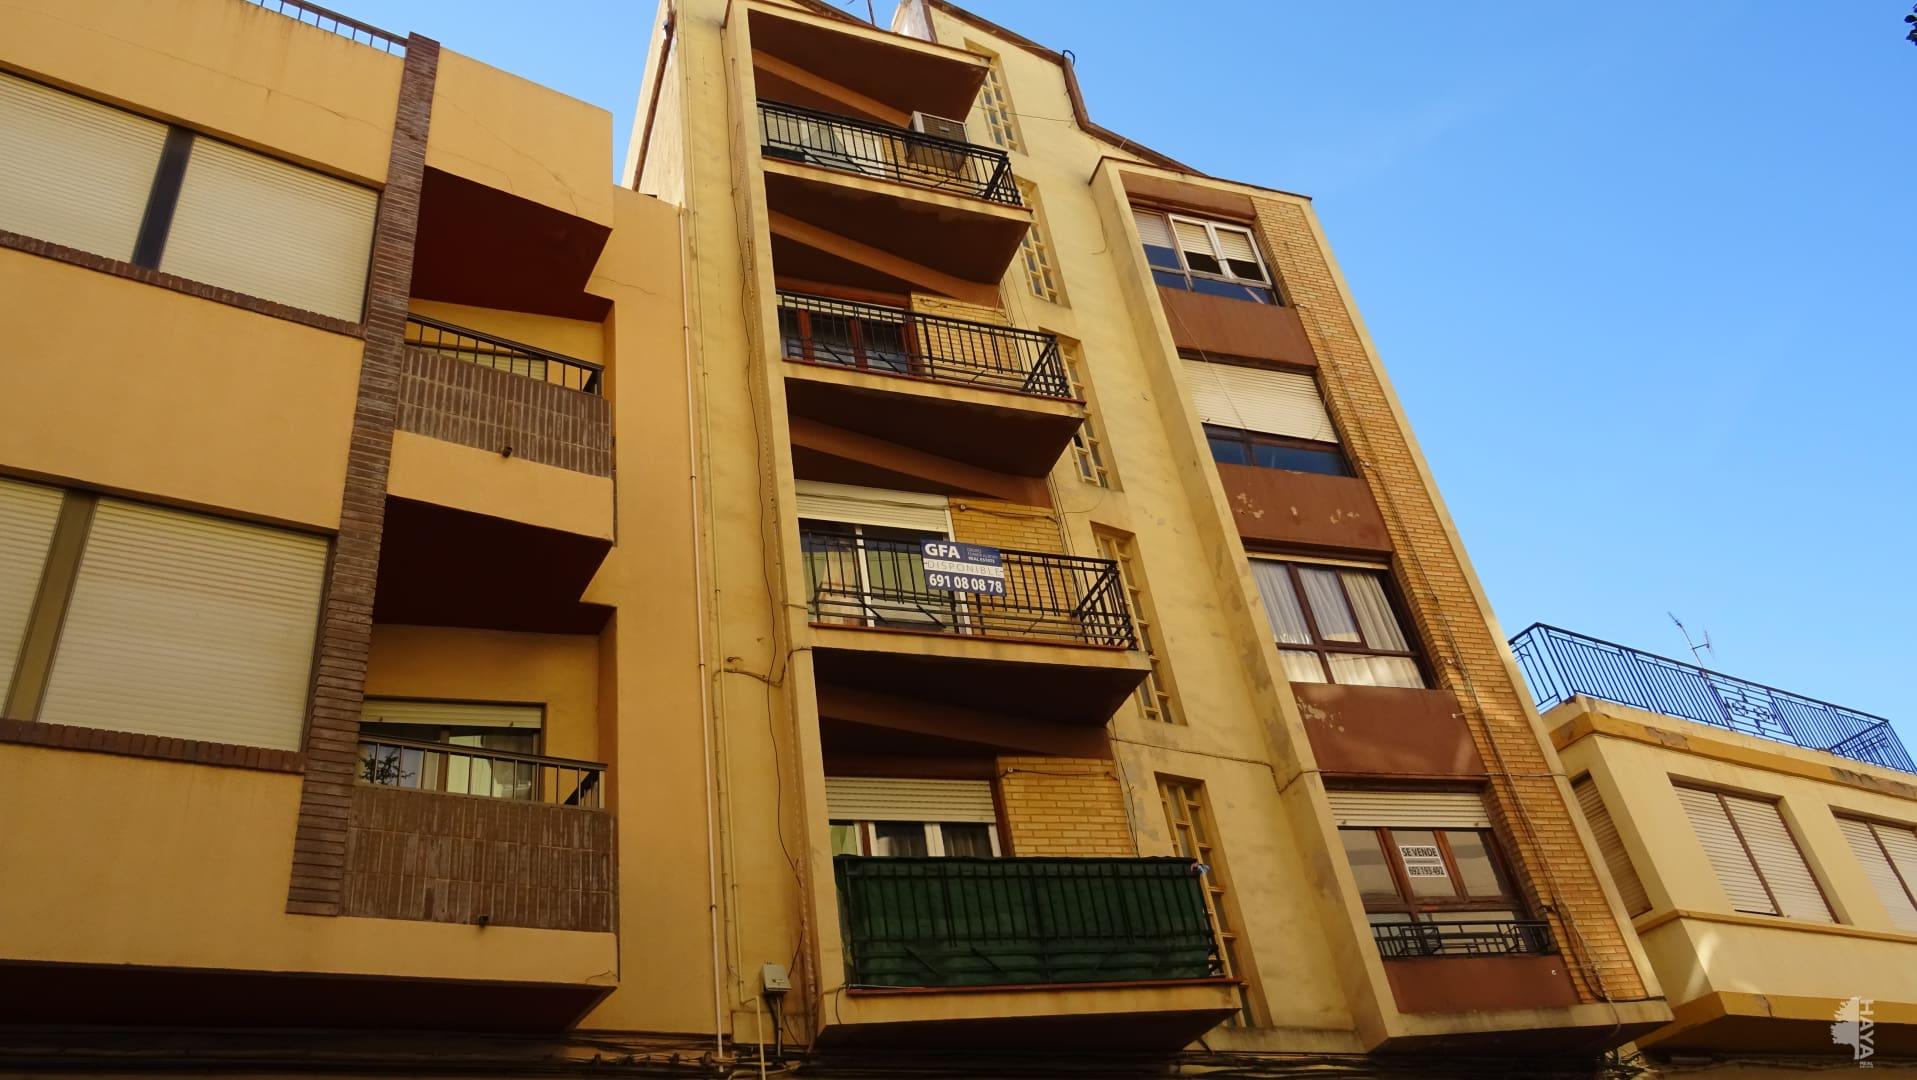 Piso en venta en Grupo San Pedro, Onda, Castellón, Calle Monseñor Fernando Ferris, 35.200 €, 3 habitaciones, 1 baño, 104 m2